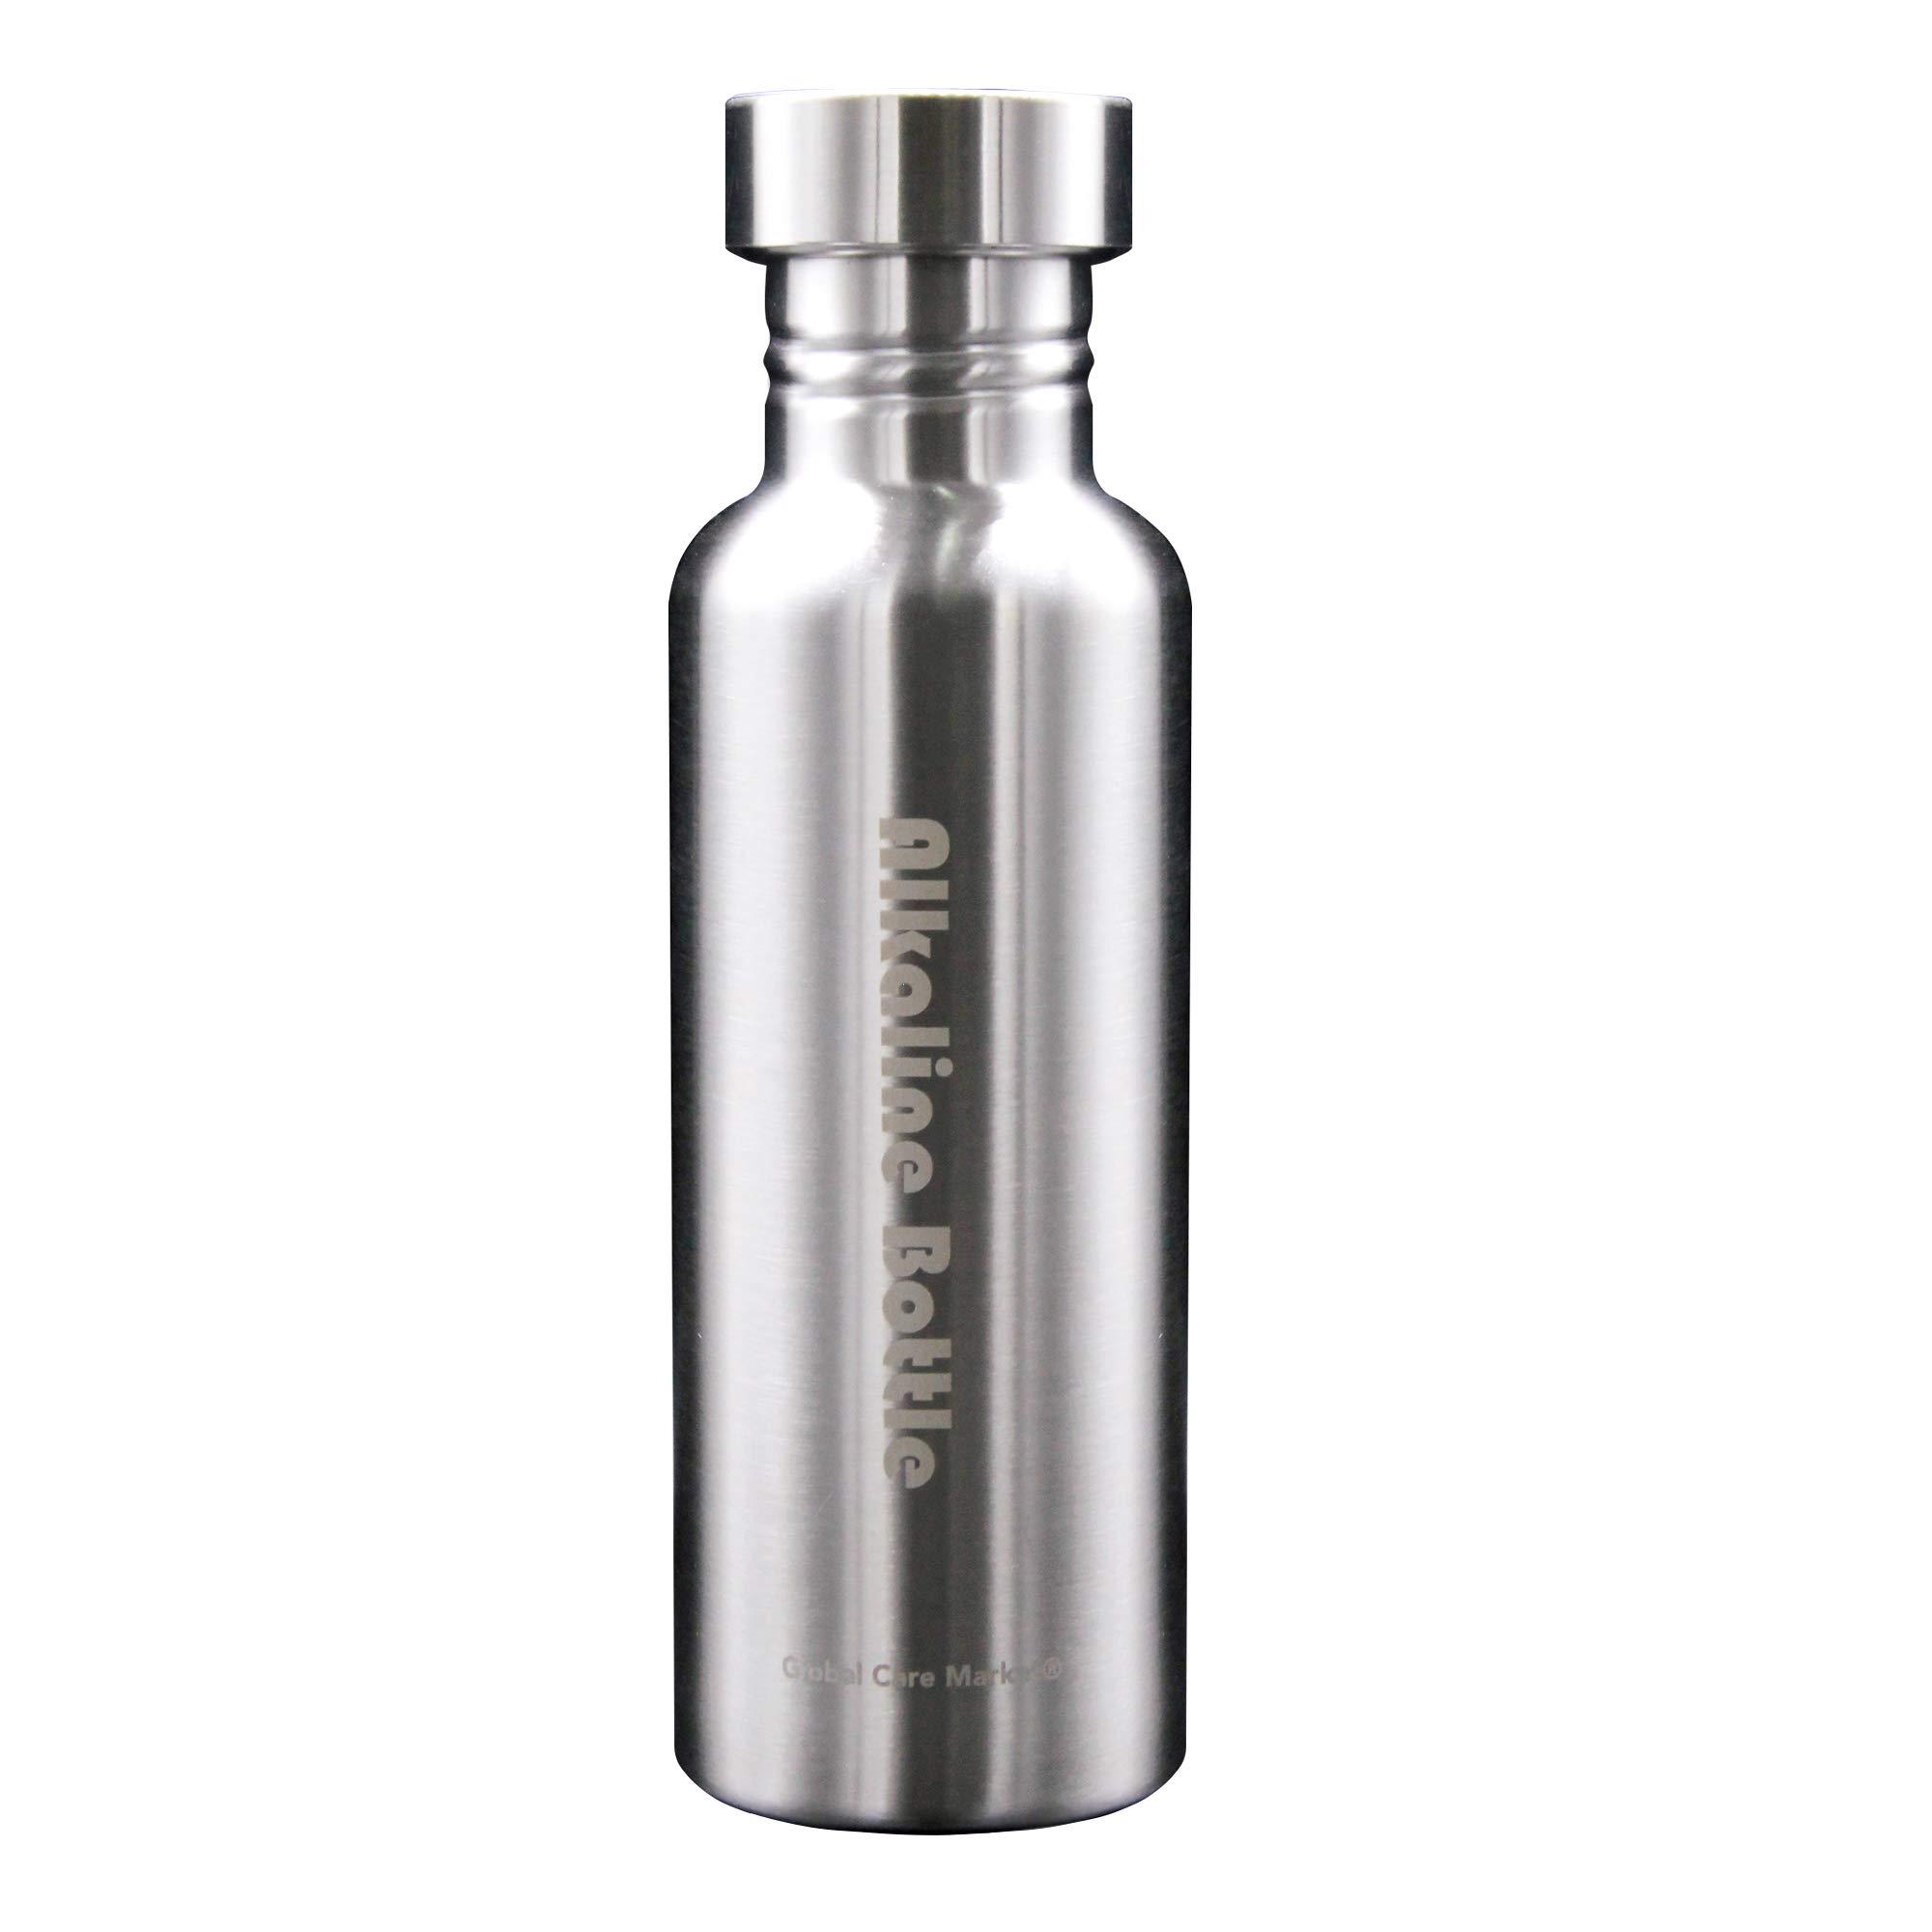 Global Care Market New Alkaline Water Bottle Big 650ml Capacity Nano Energy Water Flask Stainless Steel Alkaline Water Filter Bottle to Naturally Enhance Drinking Water by Global Care Market